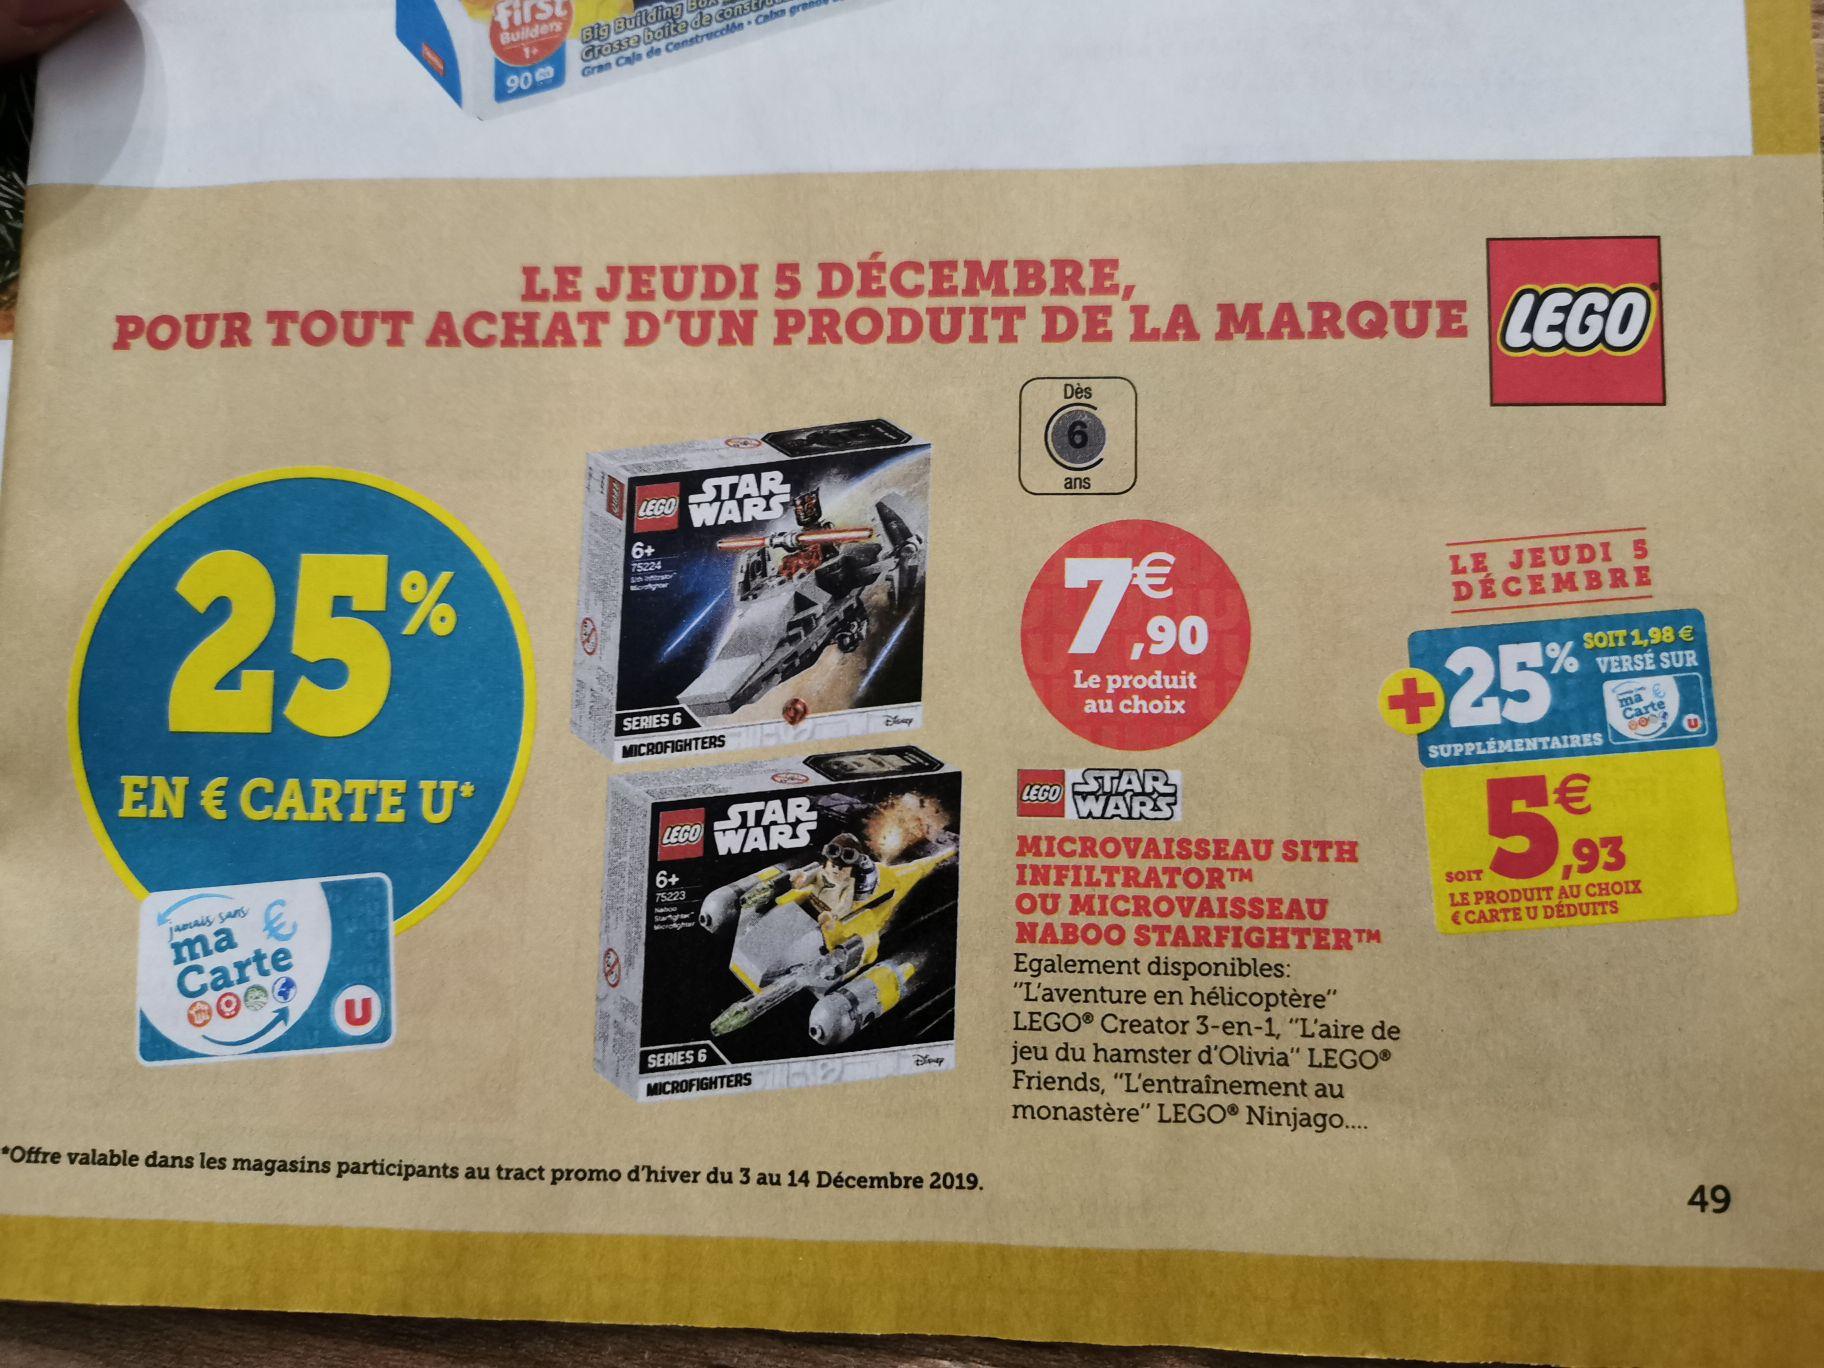 Lego Star wars microfighter et autres